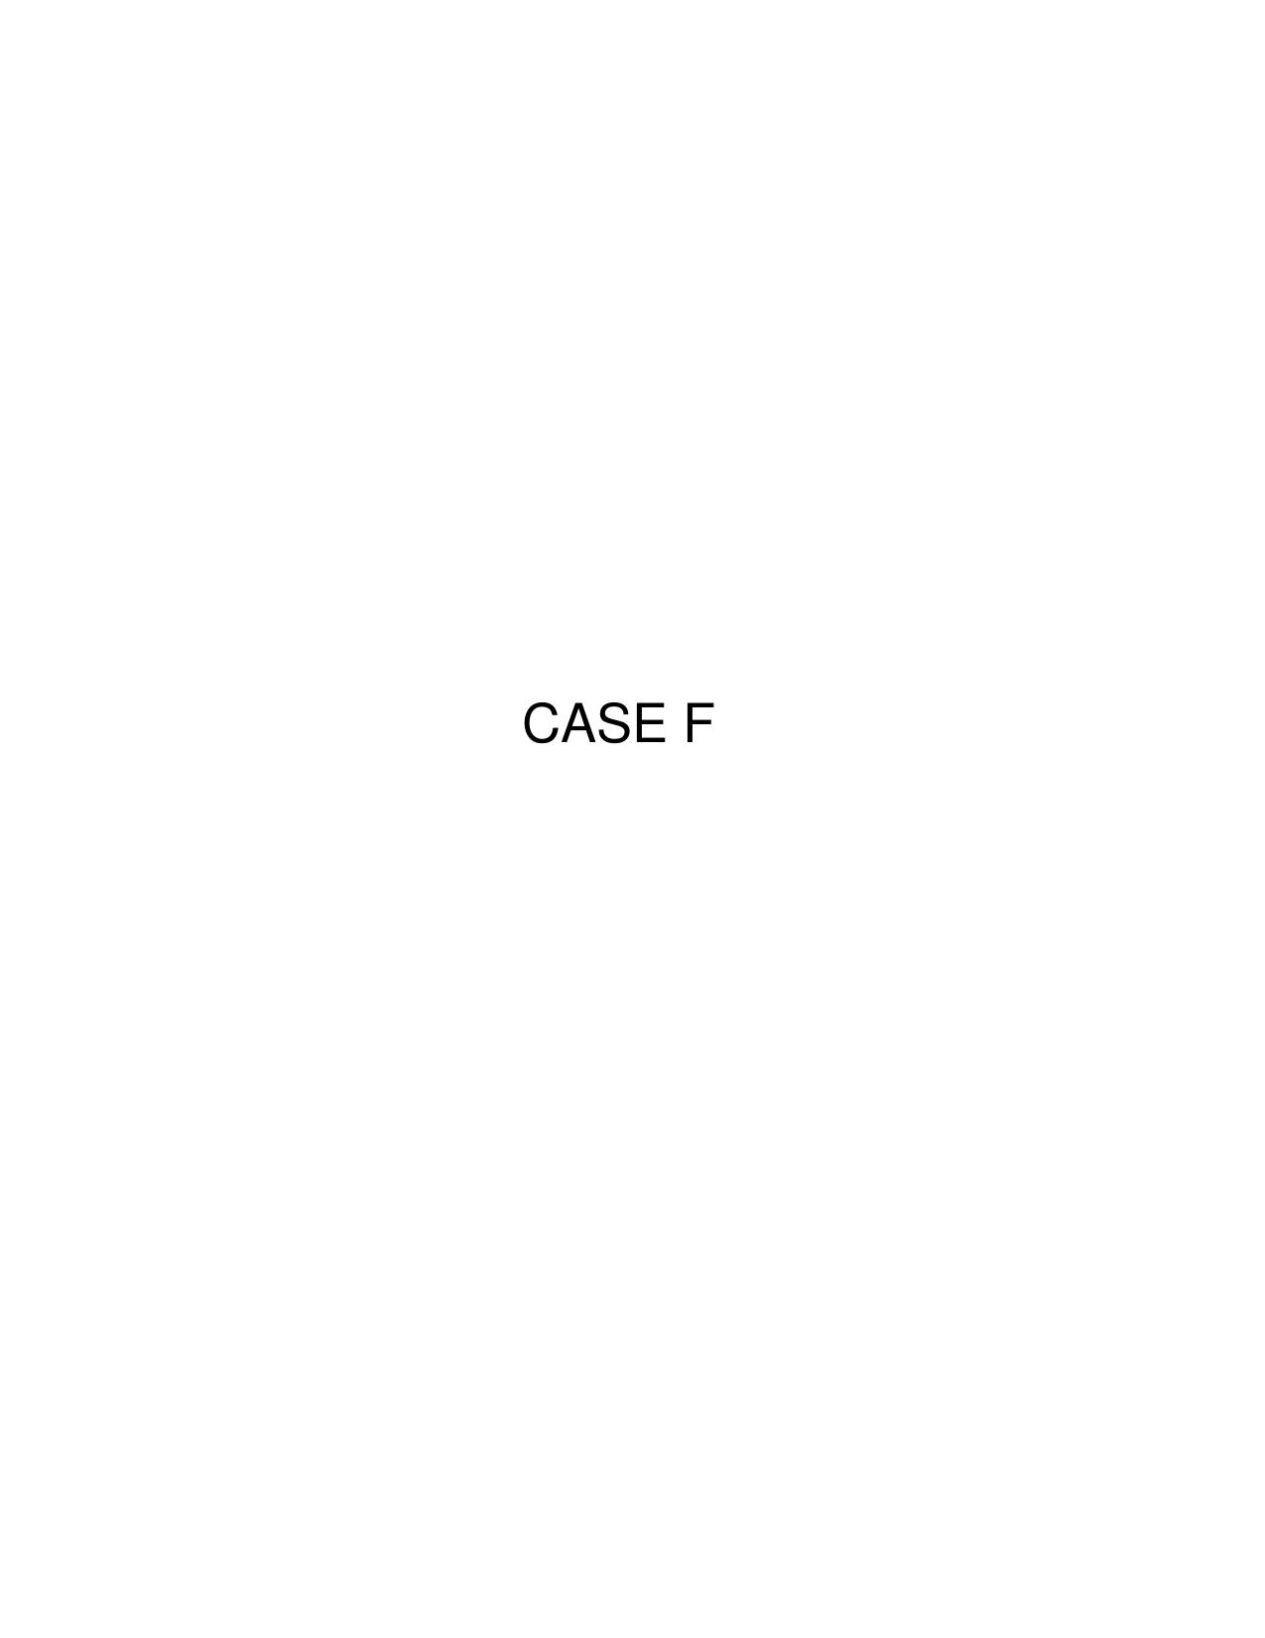 Case File F